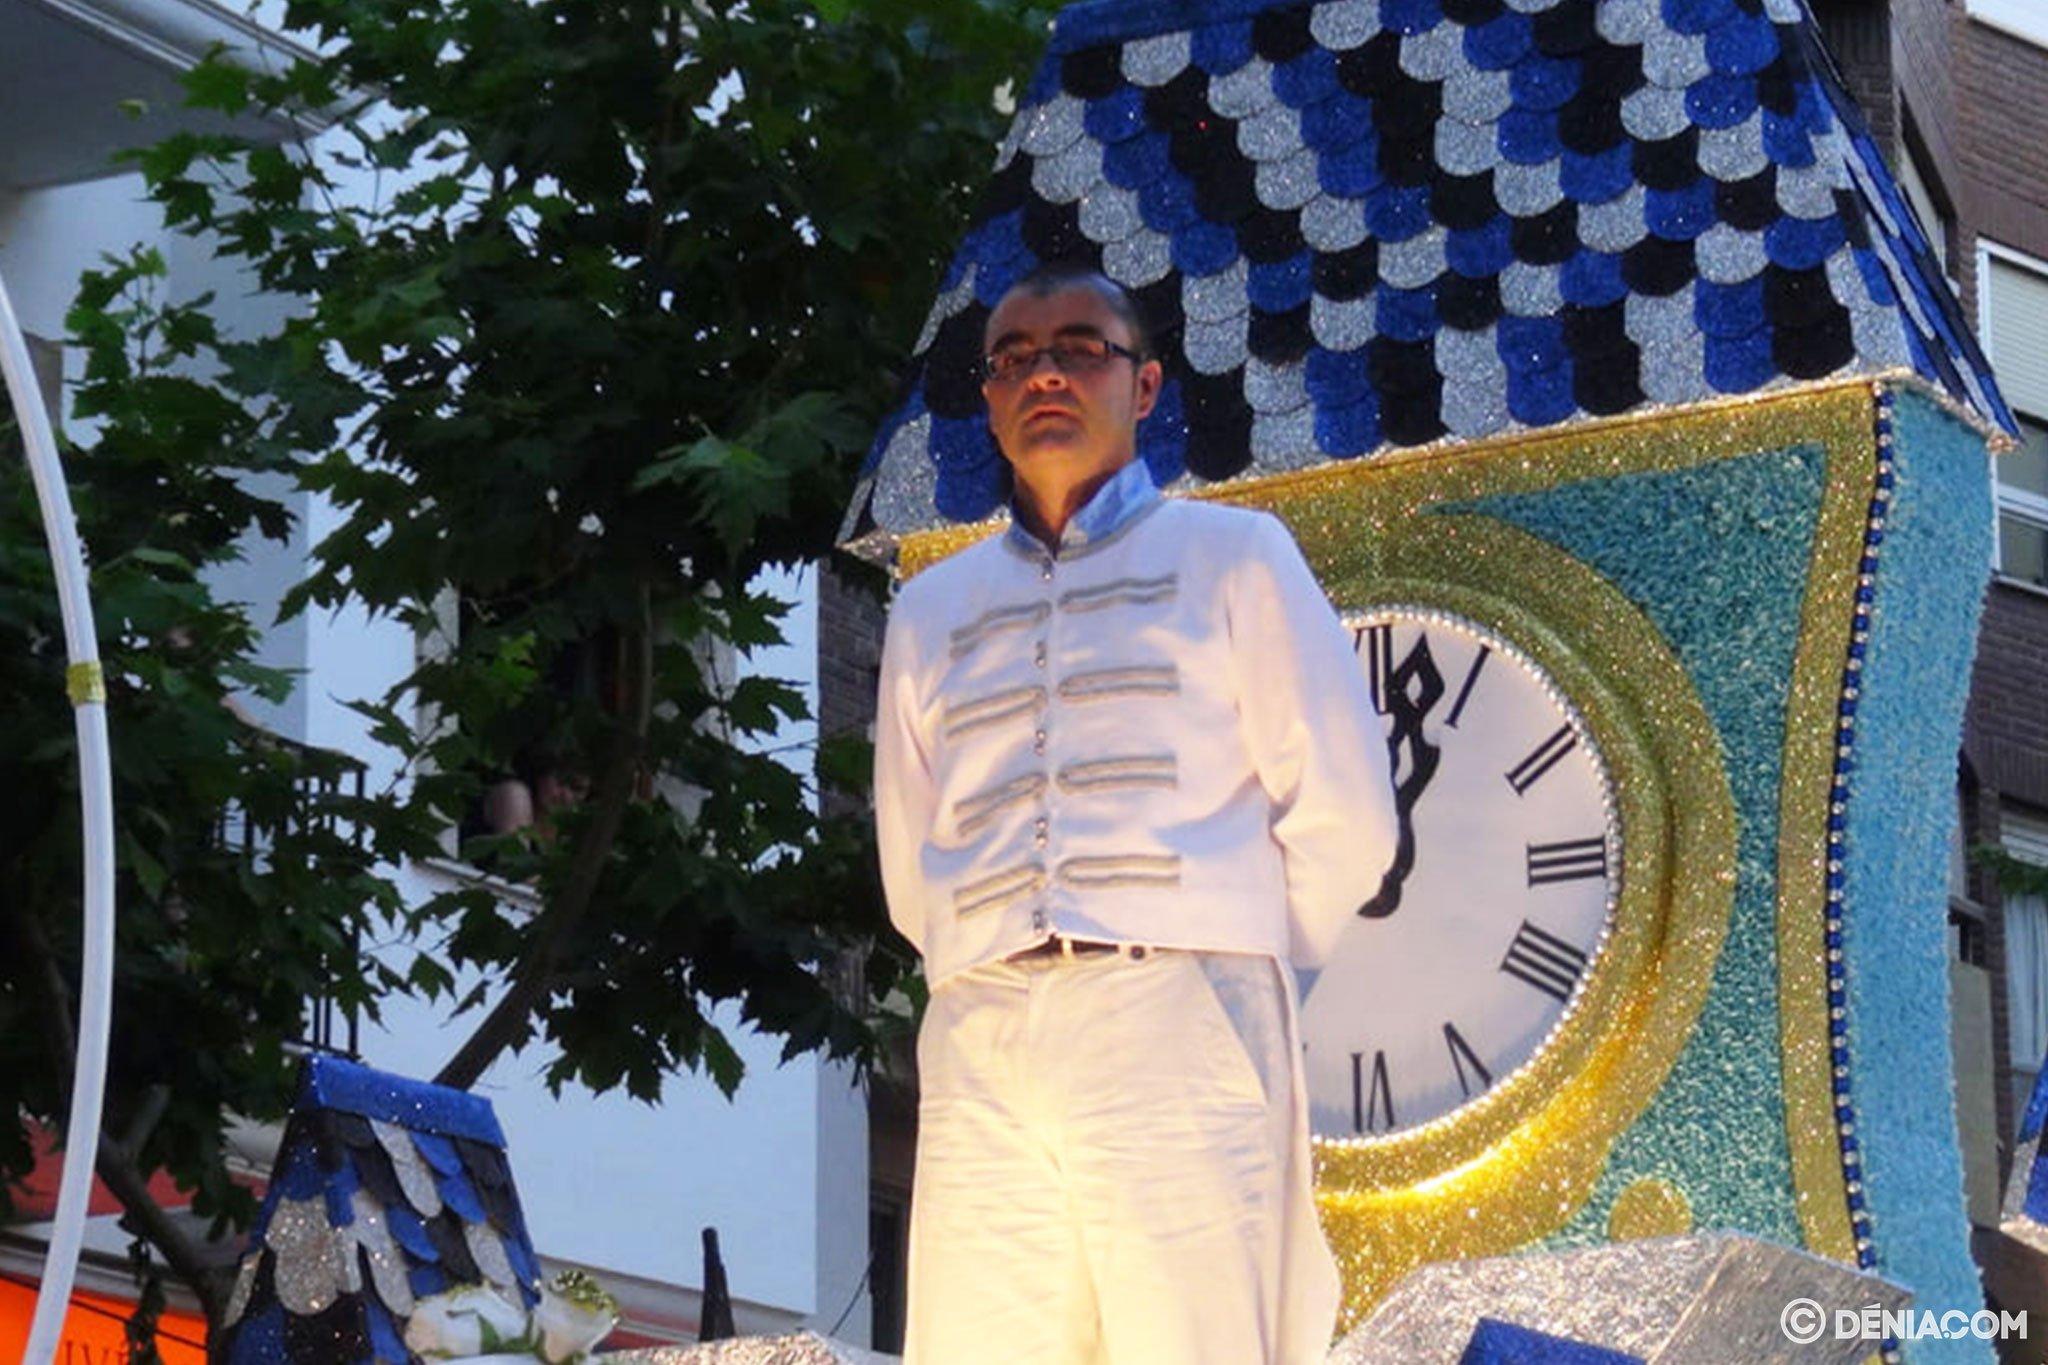 Carrozas Dénia 2015 – Presidente Les Roques